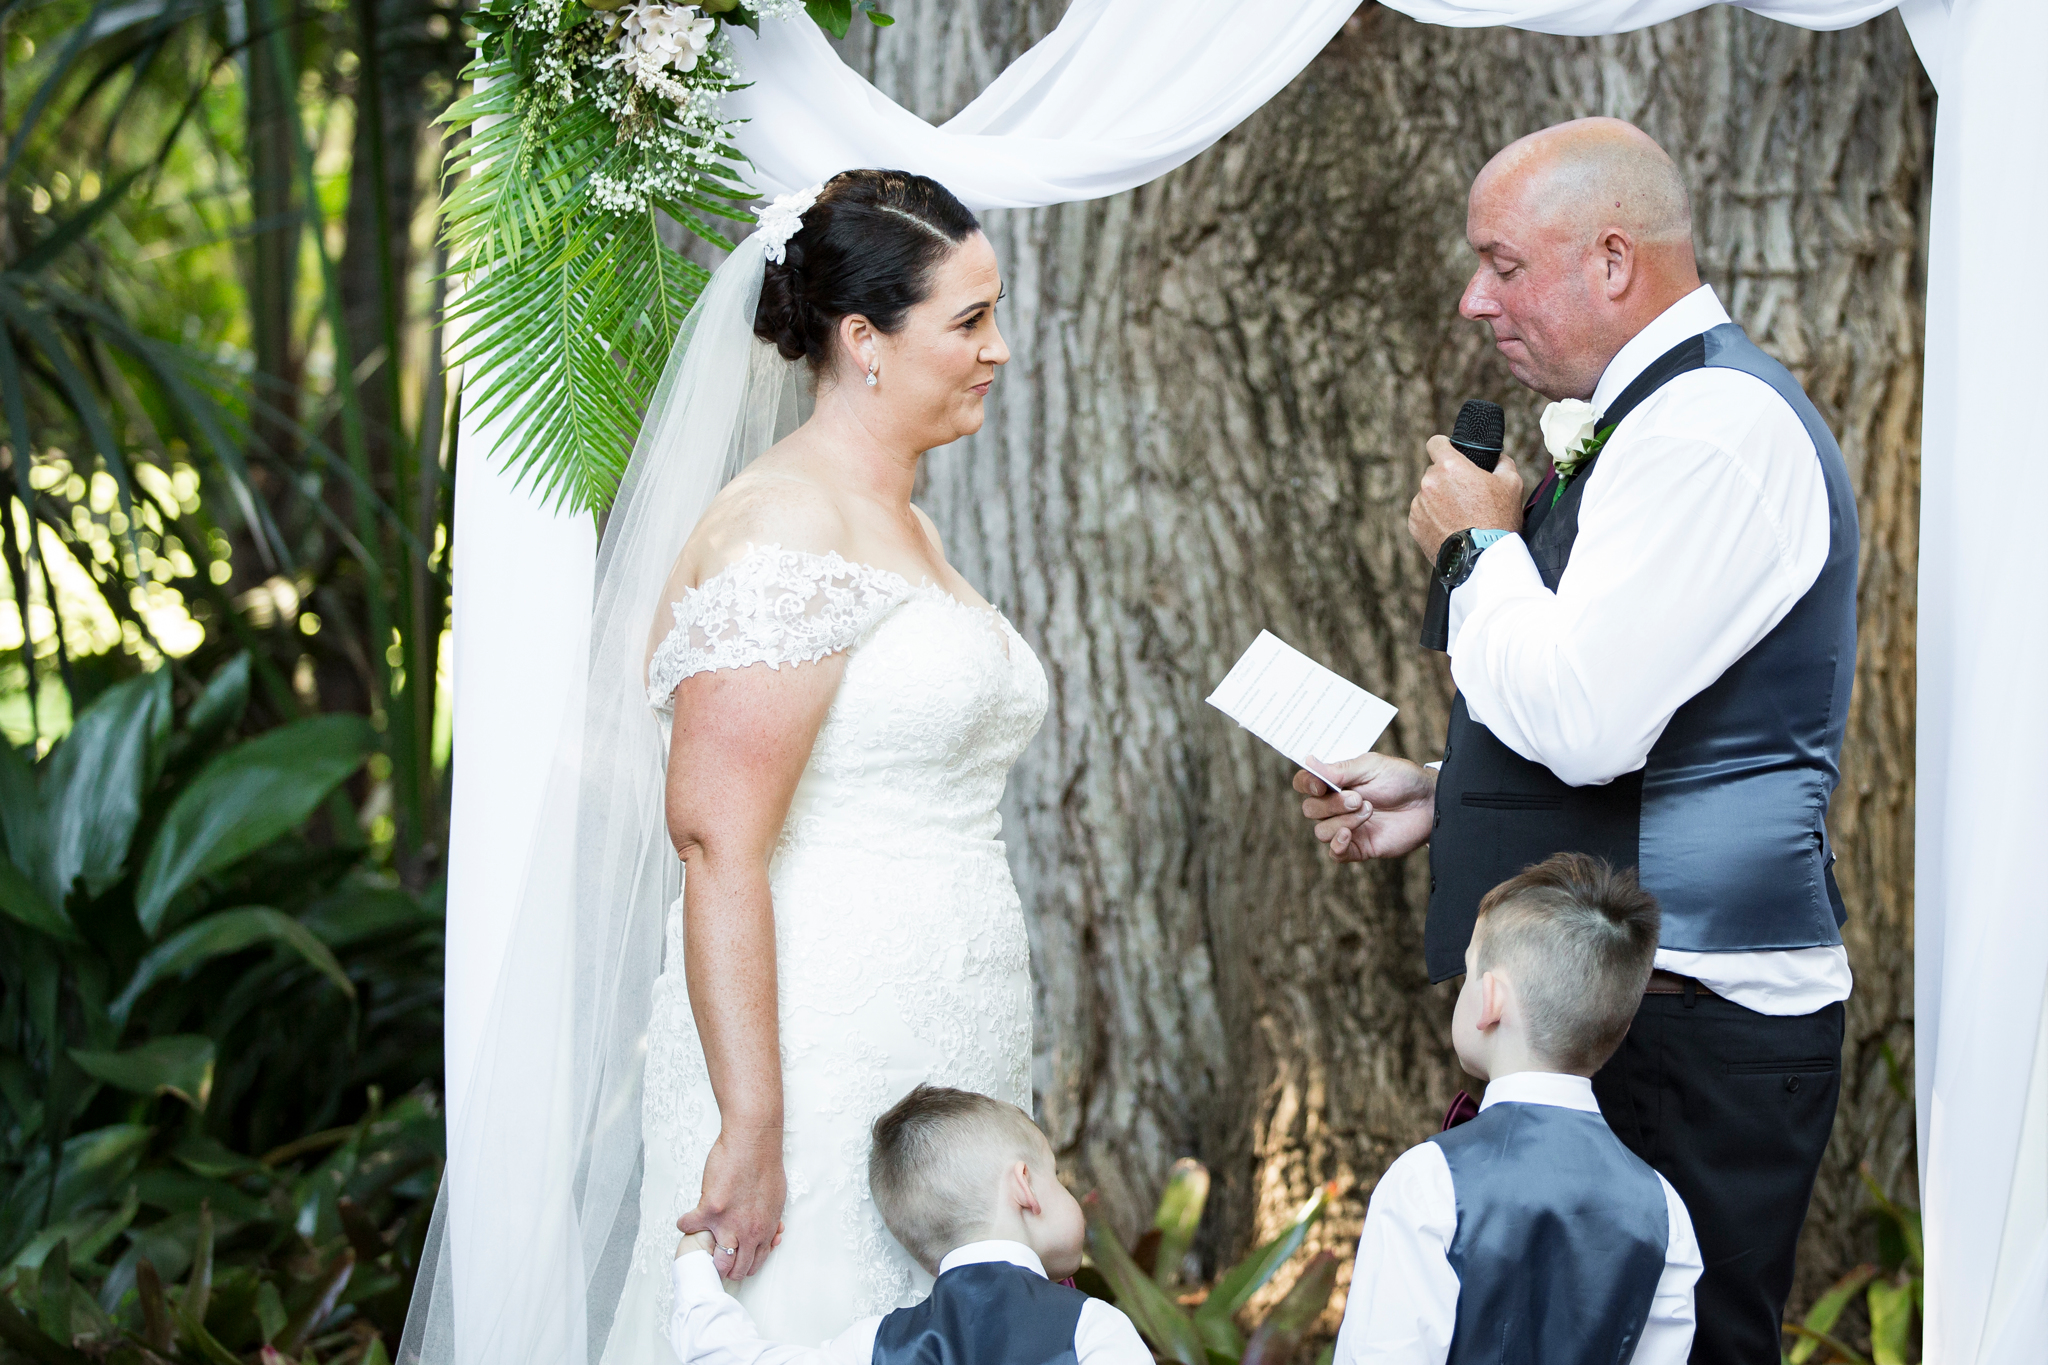 Kyme-steve-wedding-79.jpg